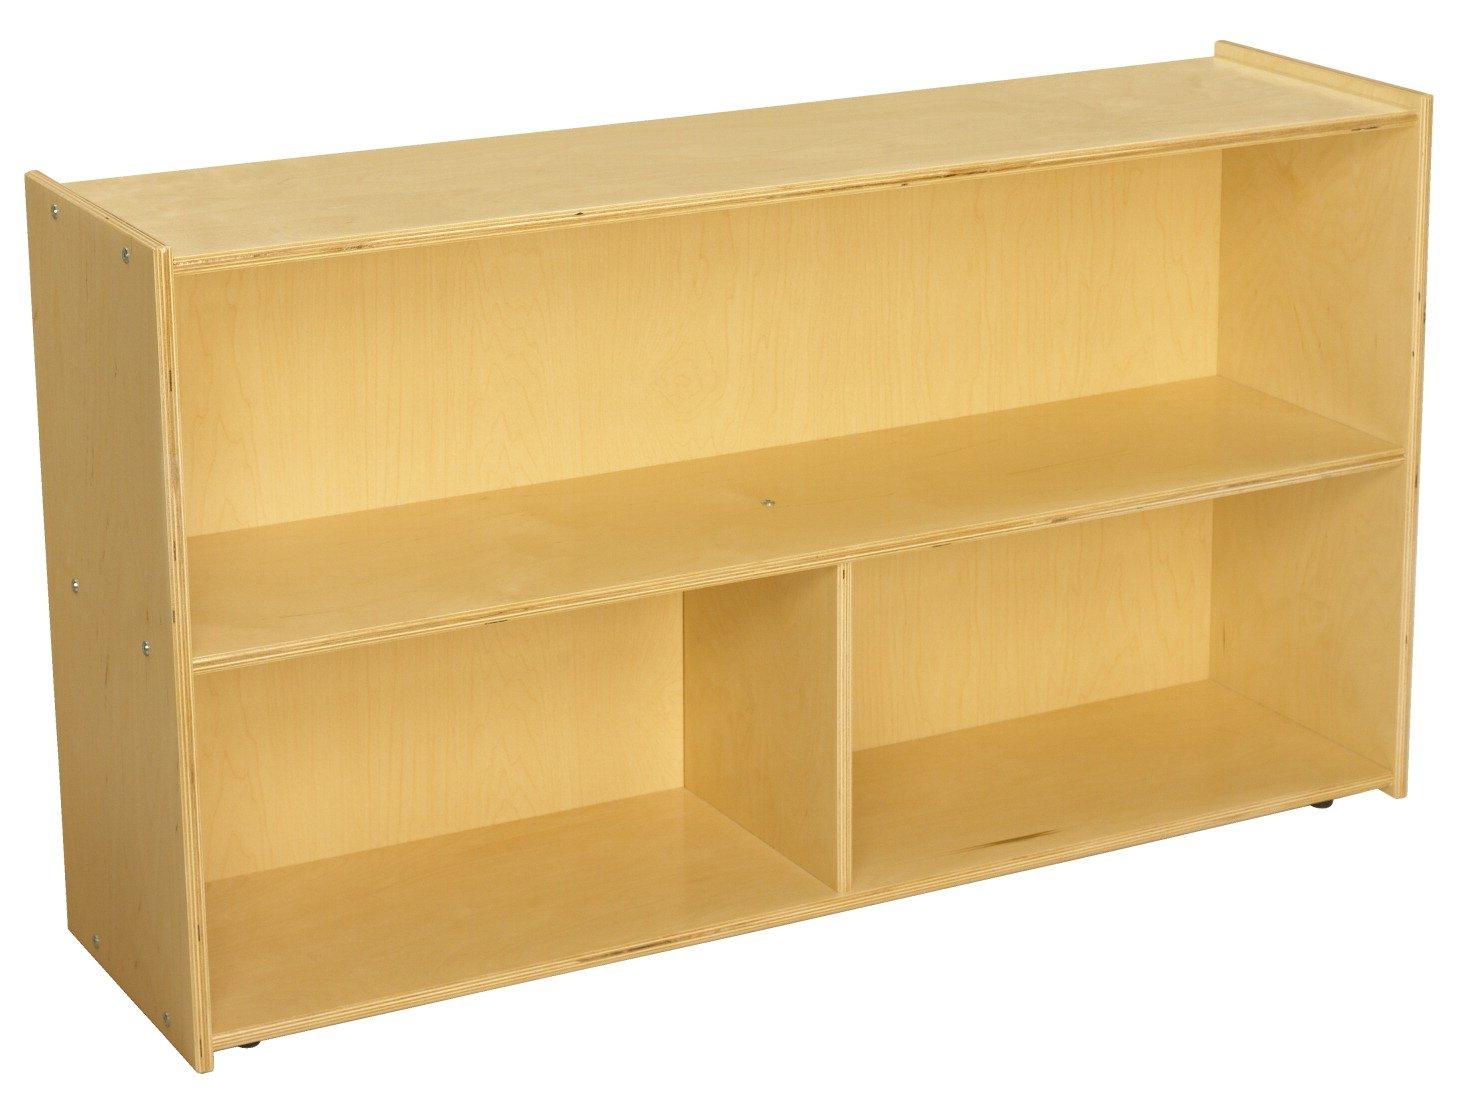 Childcraft ABC Furnishings 2-Shelf, 3-Compartment Storage Unit, 48 W x 13 D x 27-3/8 H in